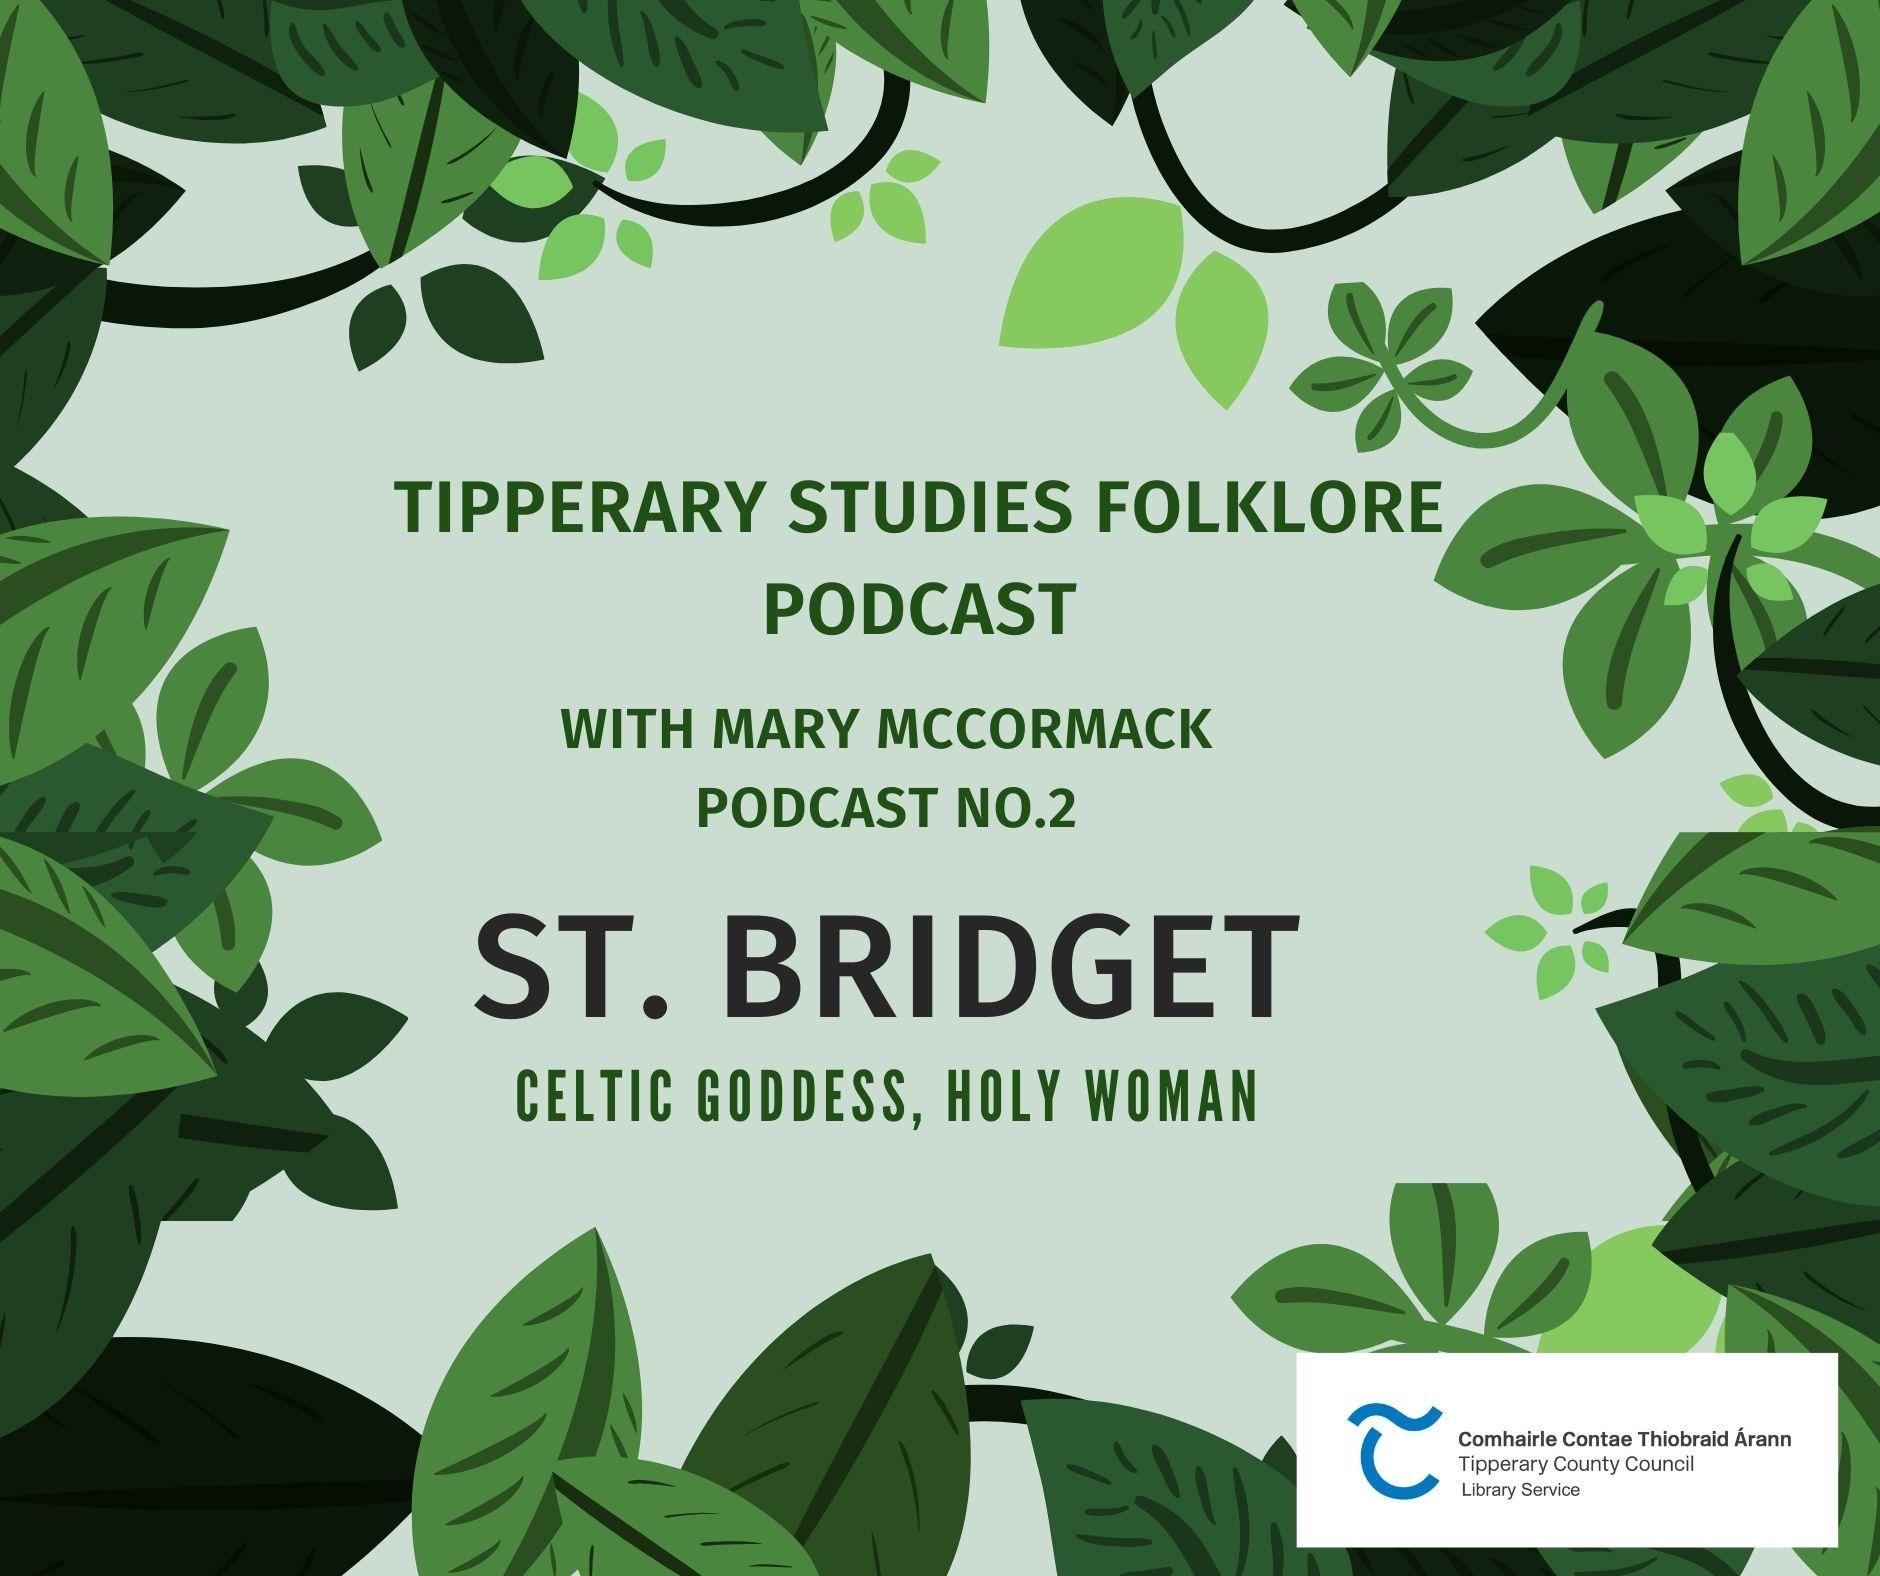 Folklore Podcast 3; Bridget Celtic Goddess Holy Woman